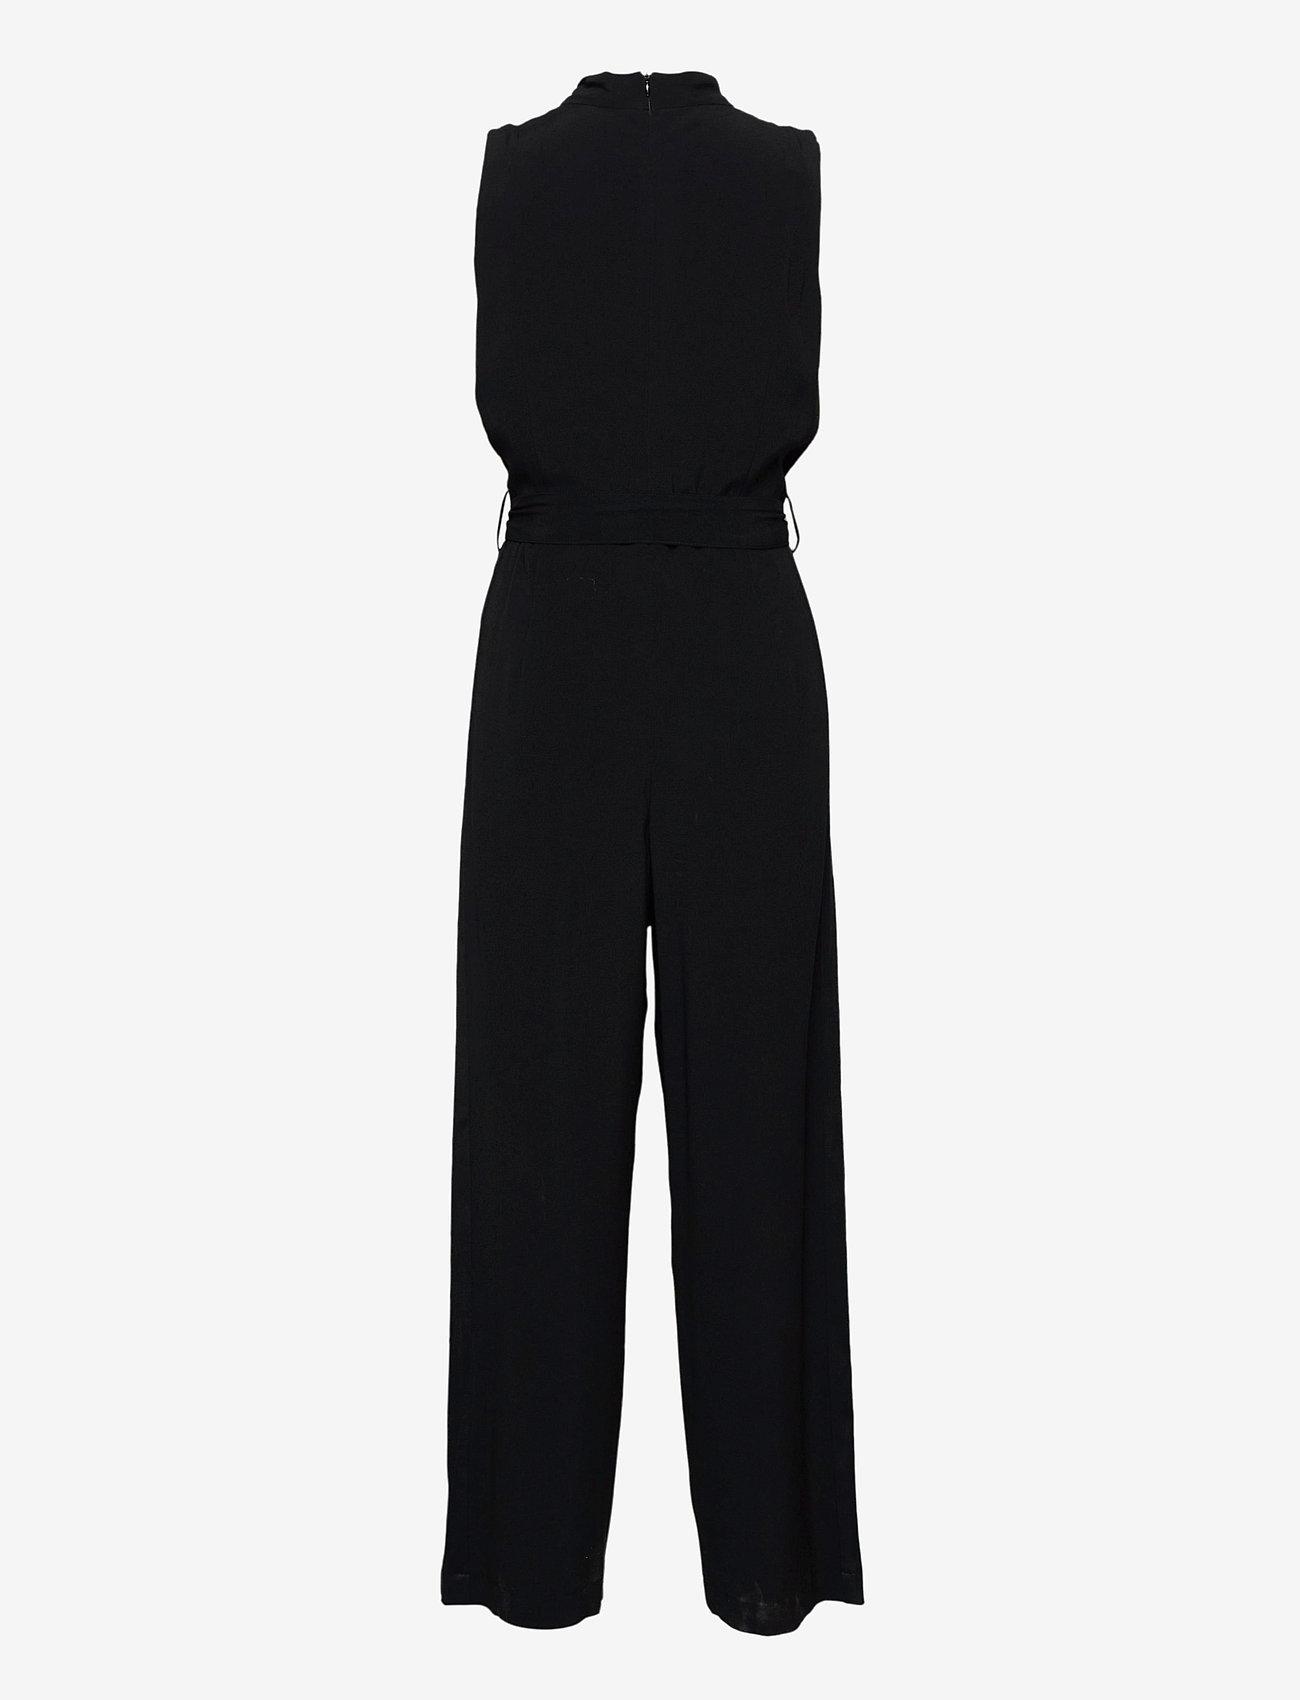 SAND - Crepe Satin Back - Whitney NT - jumpsuits - black - 1